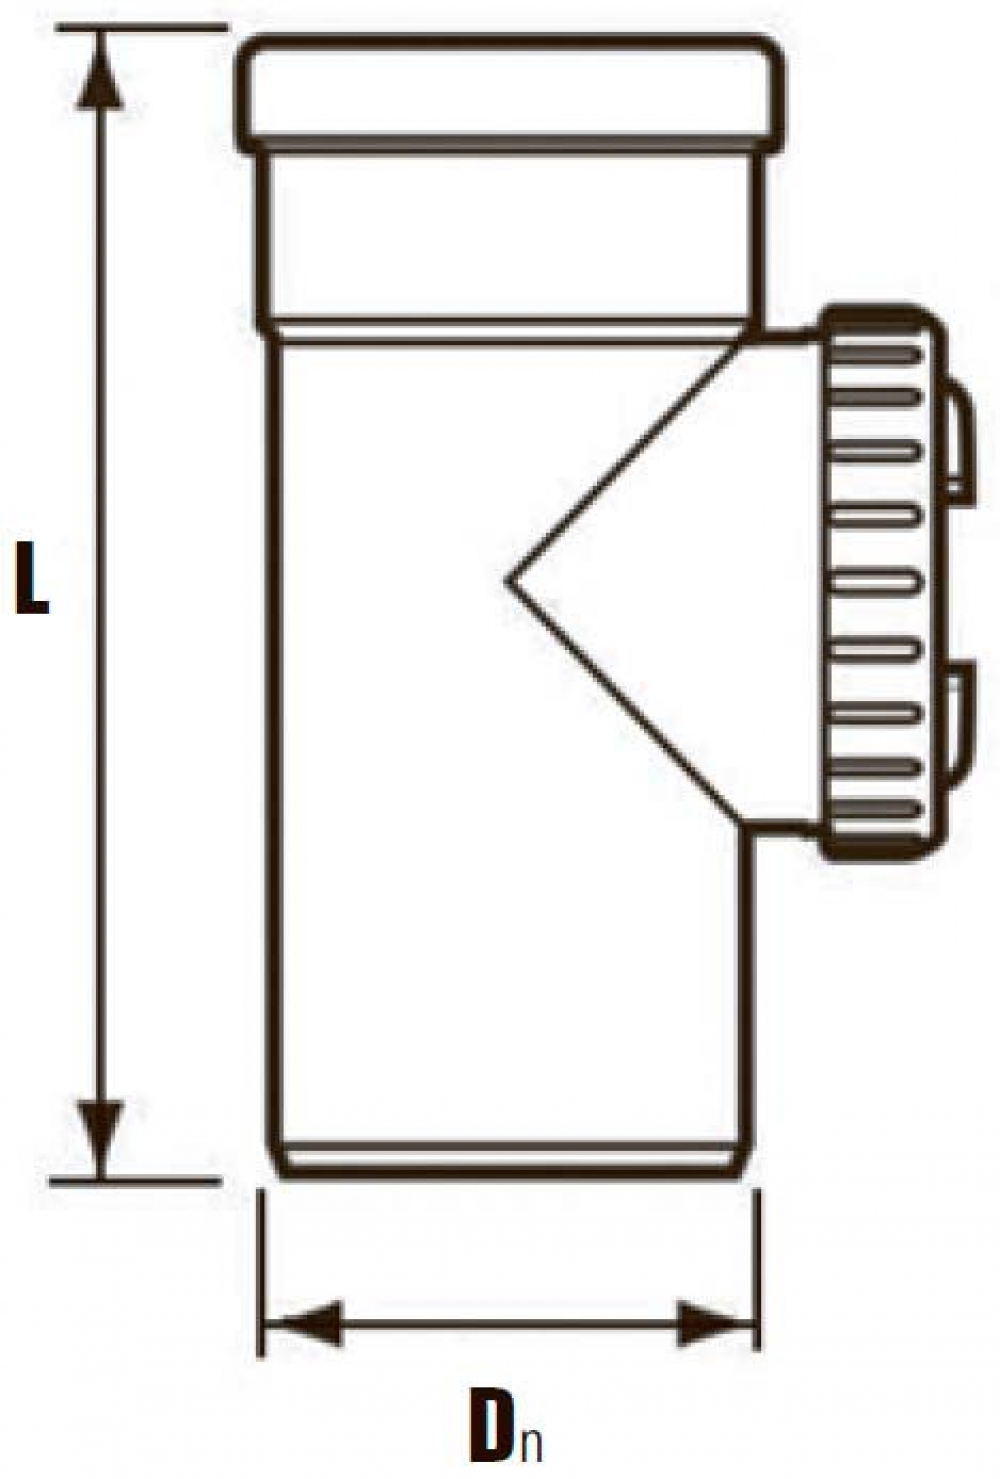 GA, участок трубы L=250 (ревизия) - DN110